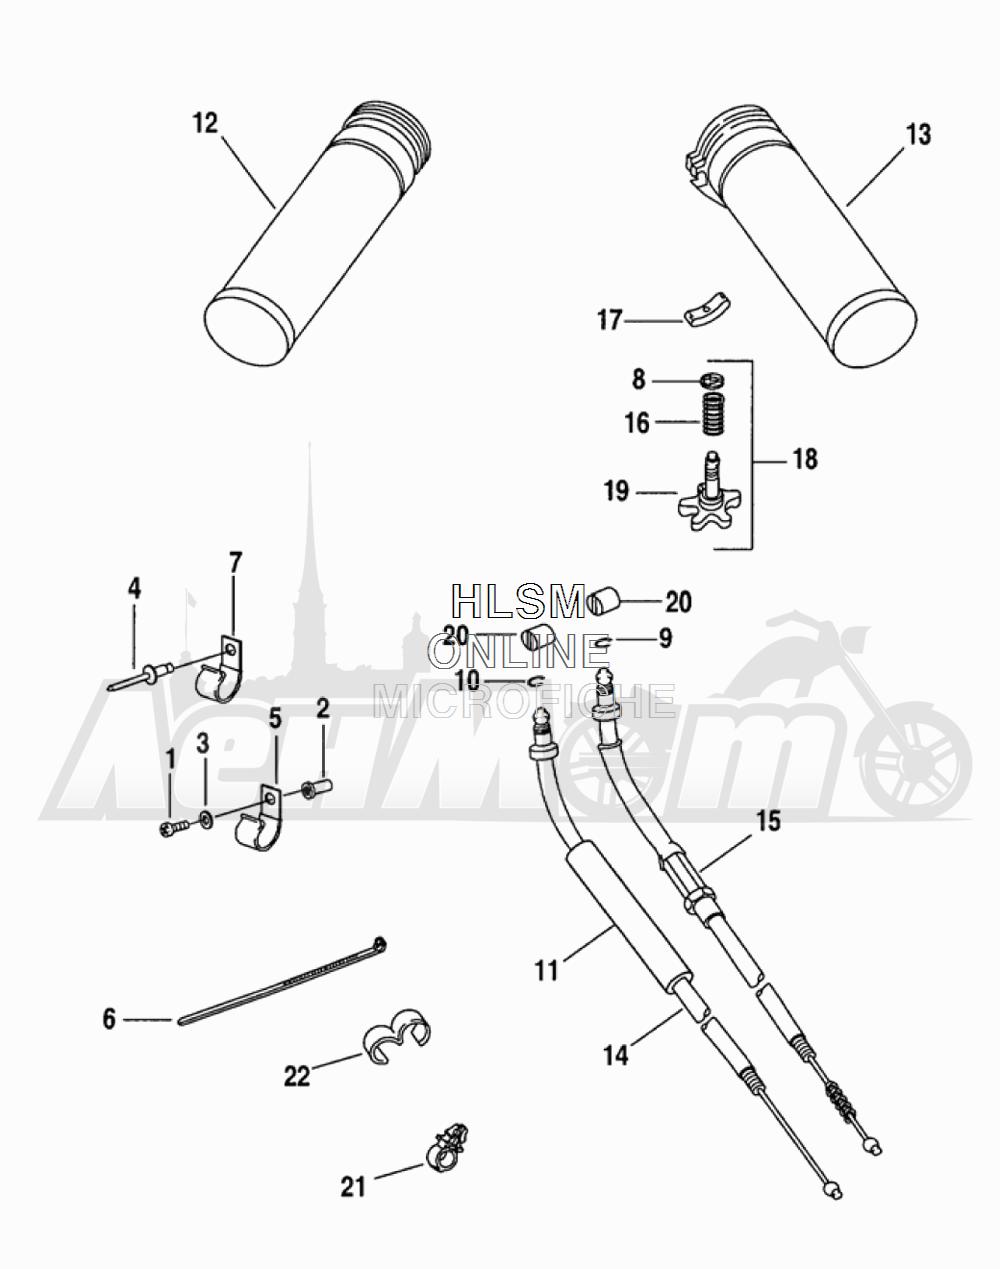 Запчасти для Мотоцикла Harley-Davidson 2005 FLTRI ROAD GLIDE® (INJECTION) (FS) Раздел: THROTTLE CONTROL ASSEMBLY W/ GRIPS | дроссель управление в сборе вместе с ручки